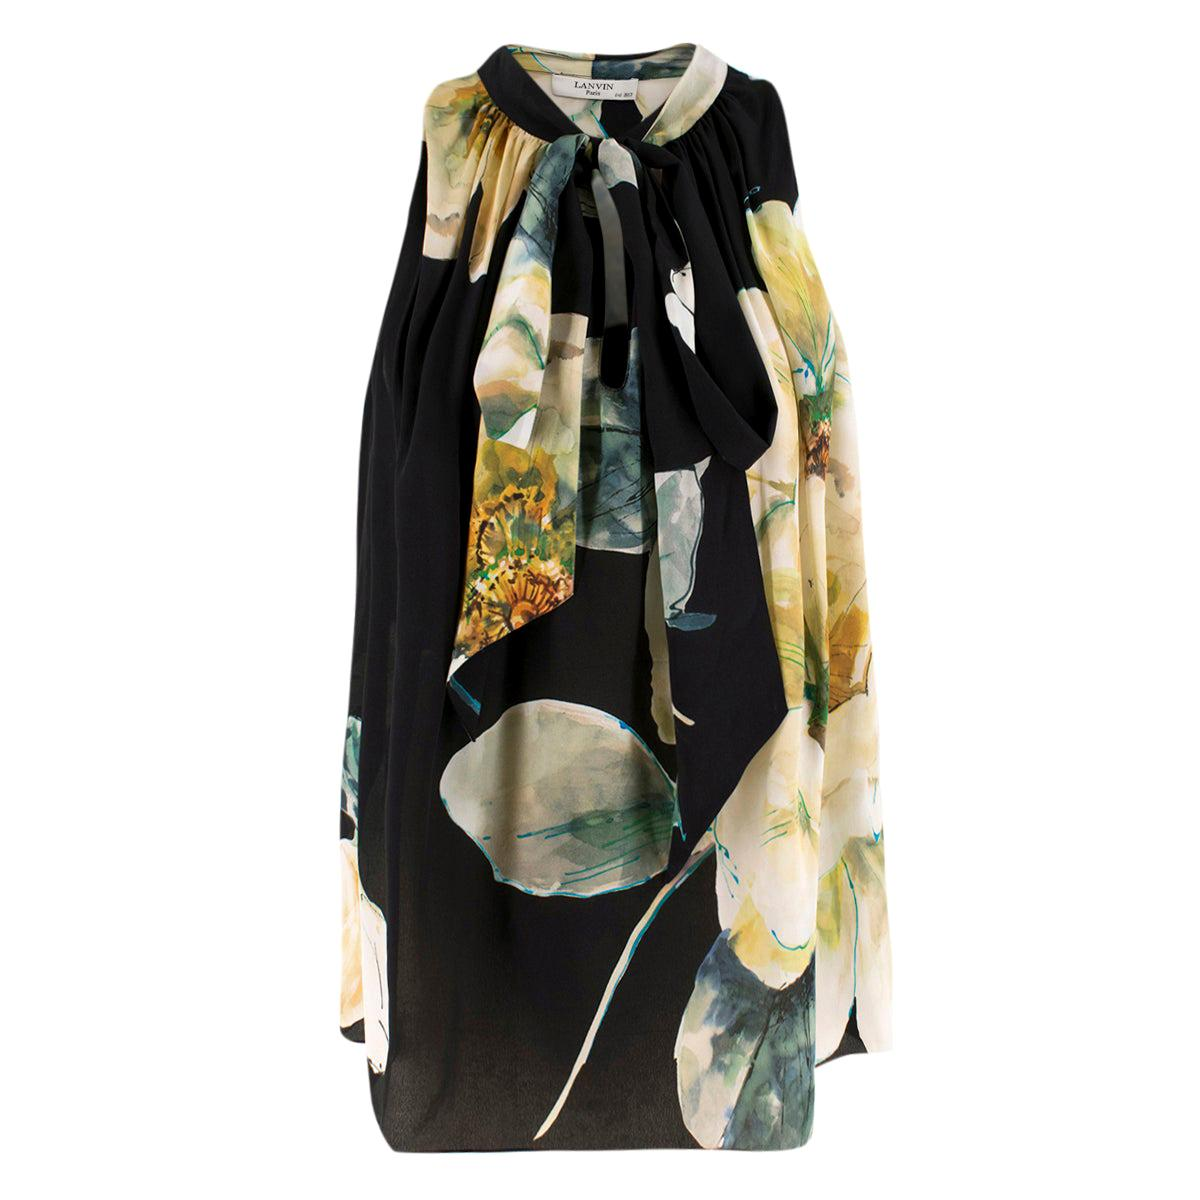 Lanvin Black Silk Floral Sleeveless Top - Size US 4